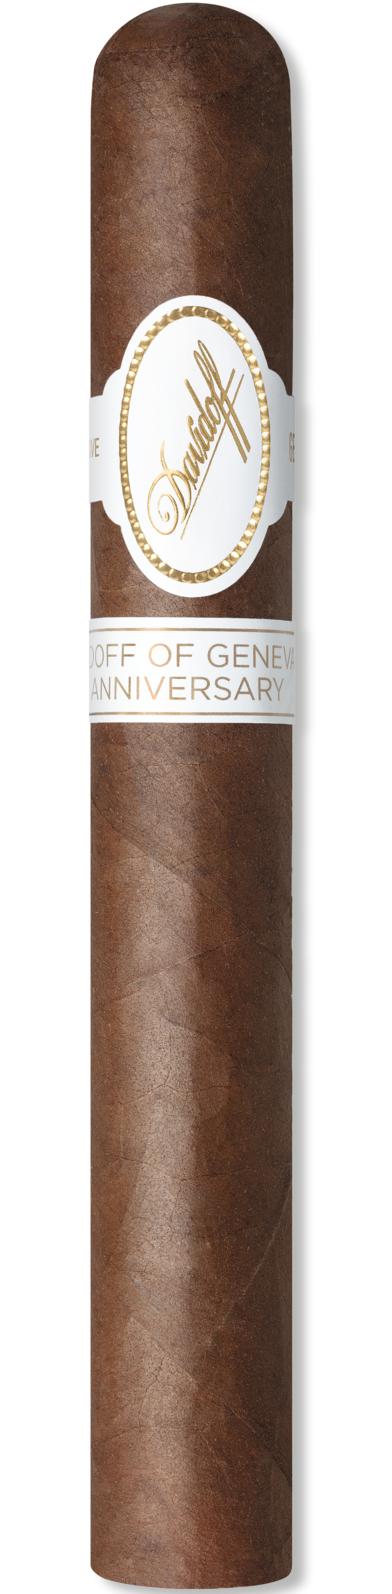 "Davidoff  Exclusive ""Davidoff of Geneva Germany – 5th Anniversary"""